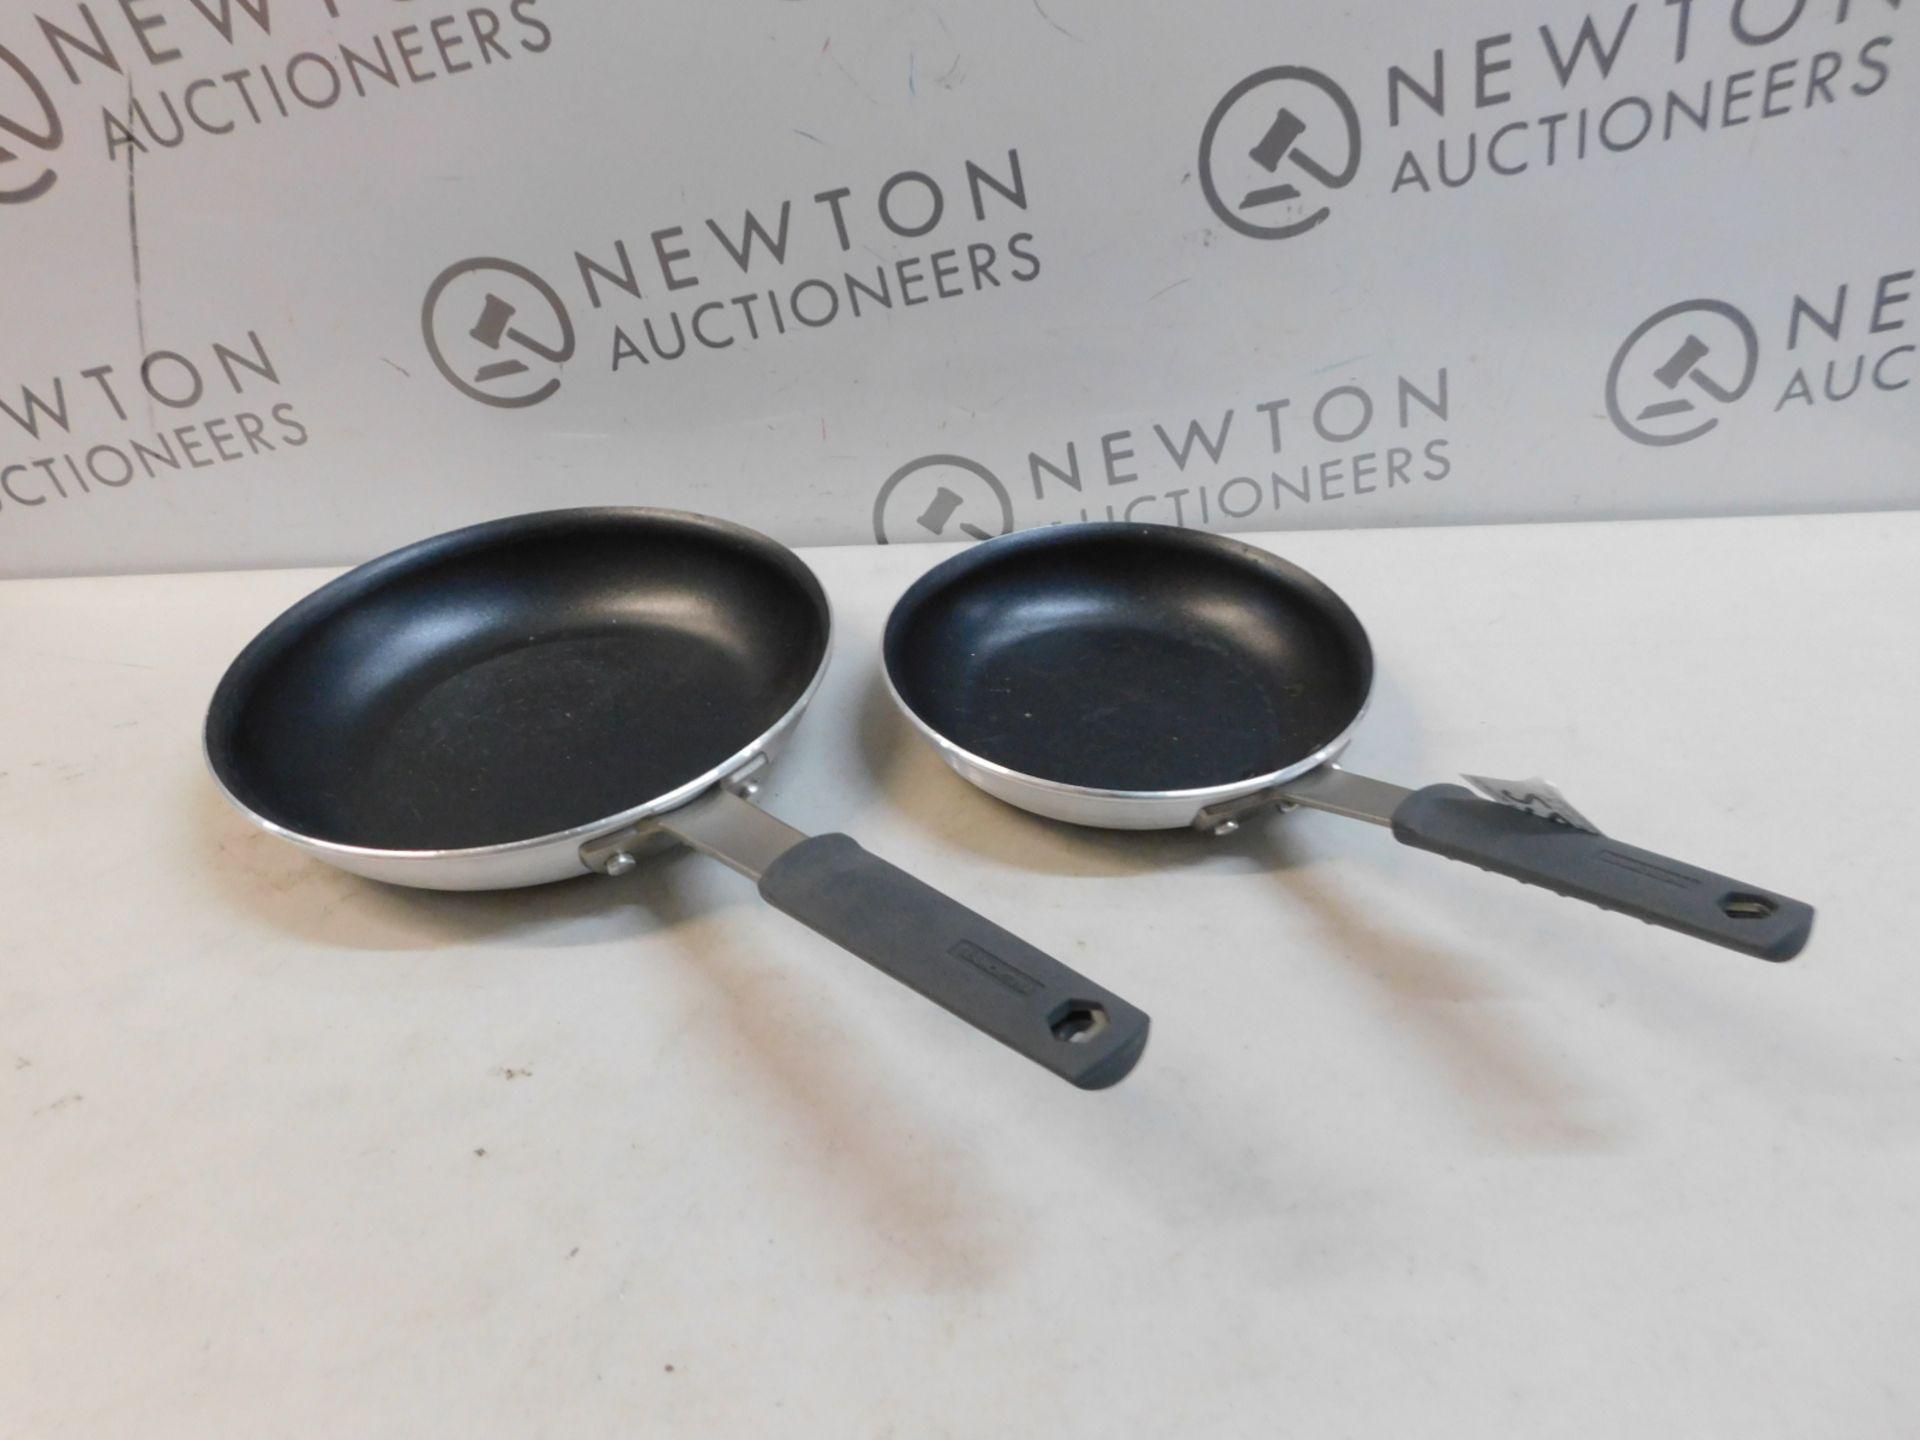 1 SET OF 2 TRAMONTINA FRYING PANS RRP £59